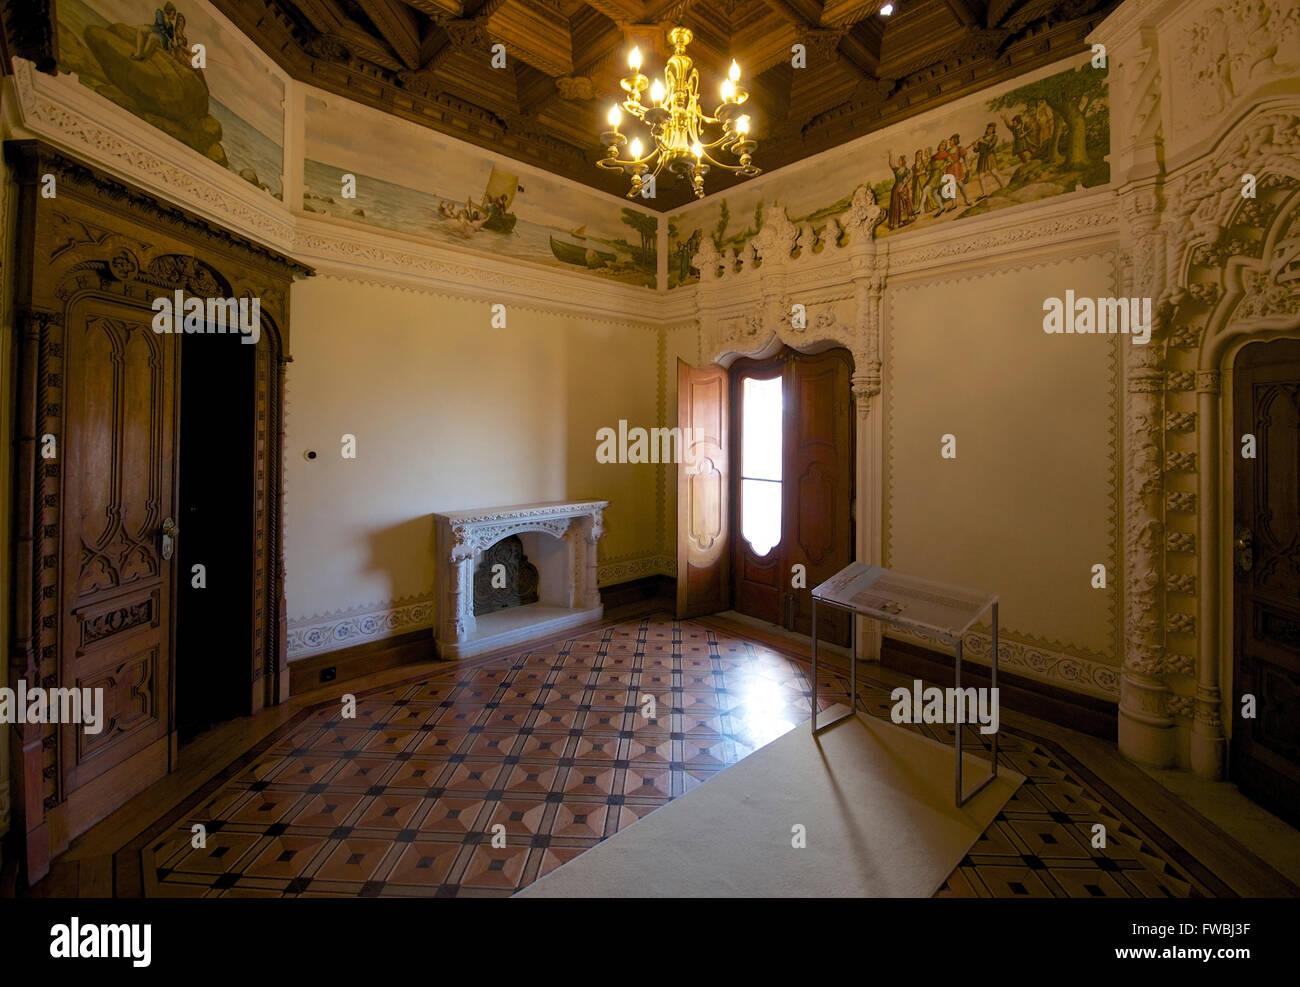 Interior of Quinta da Regaleira, Sintra, Portugal - Stock Image